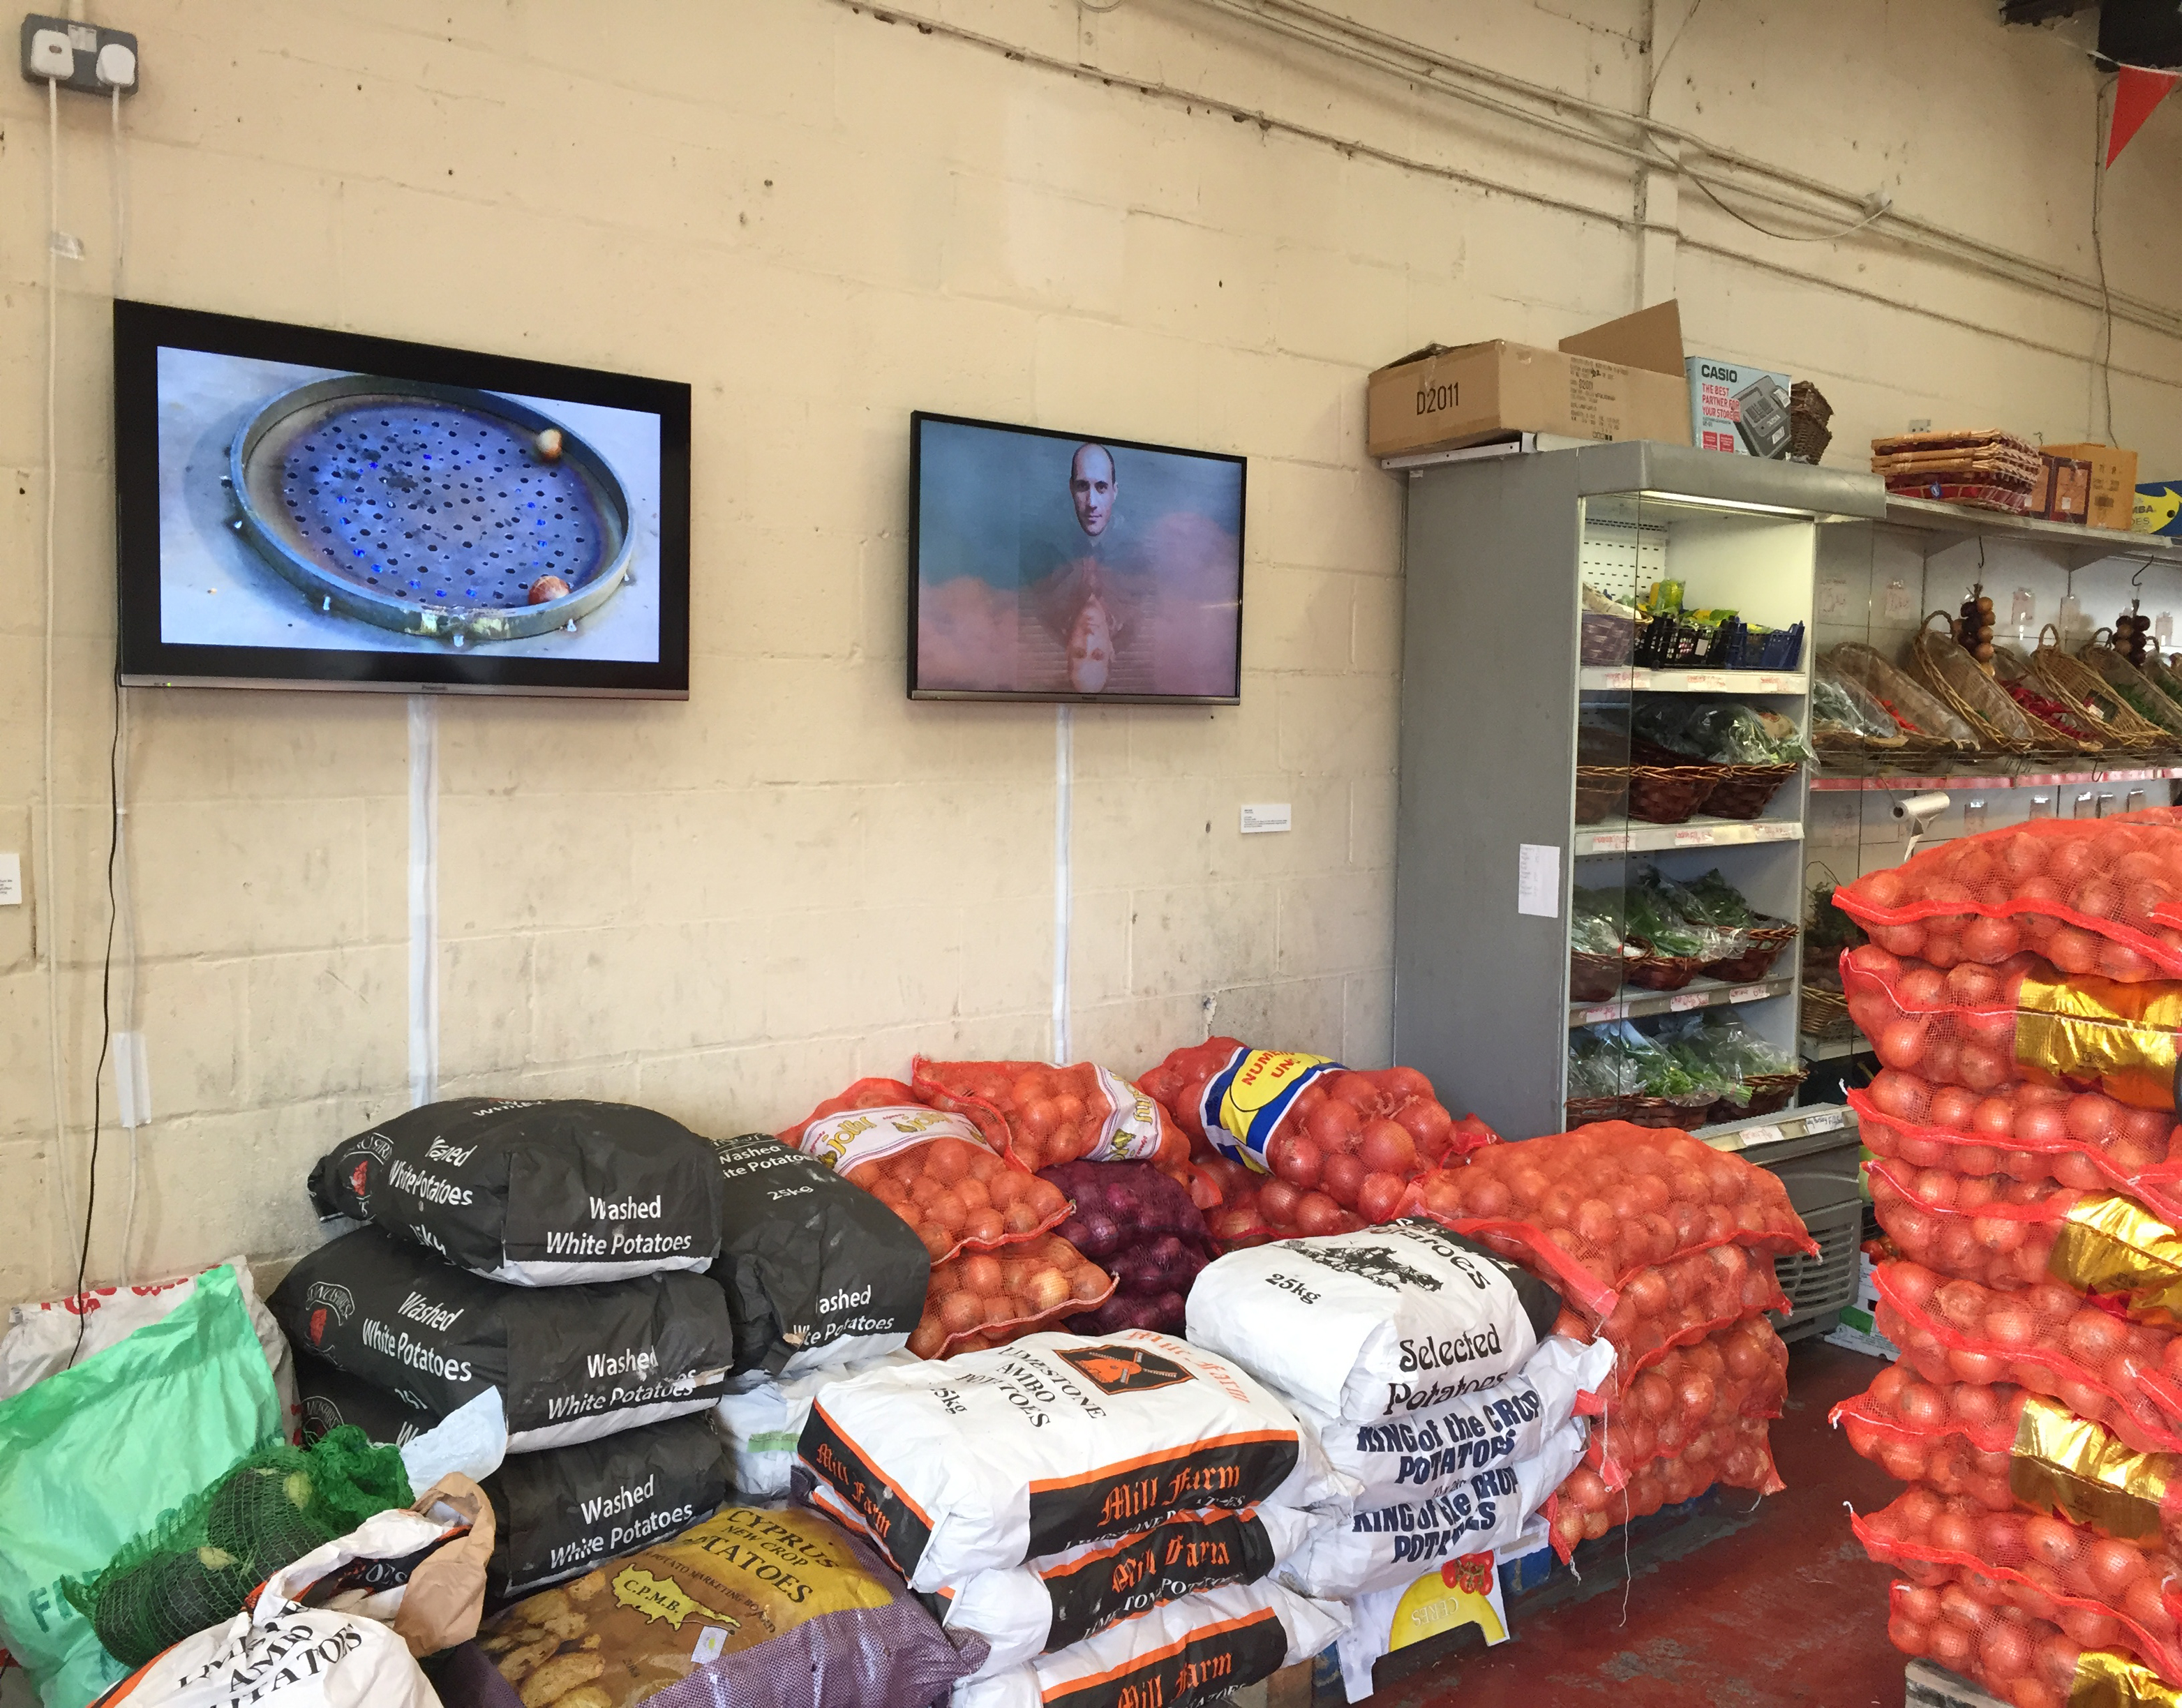 IB18: St John's Market: Alternator Studio & Project Space